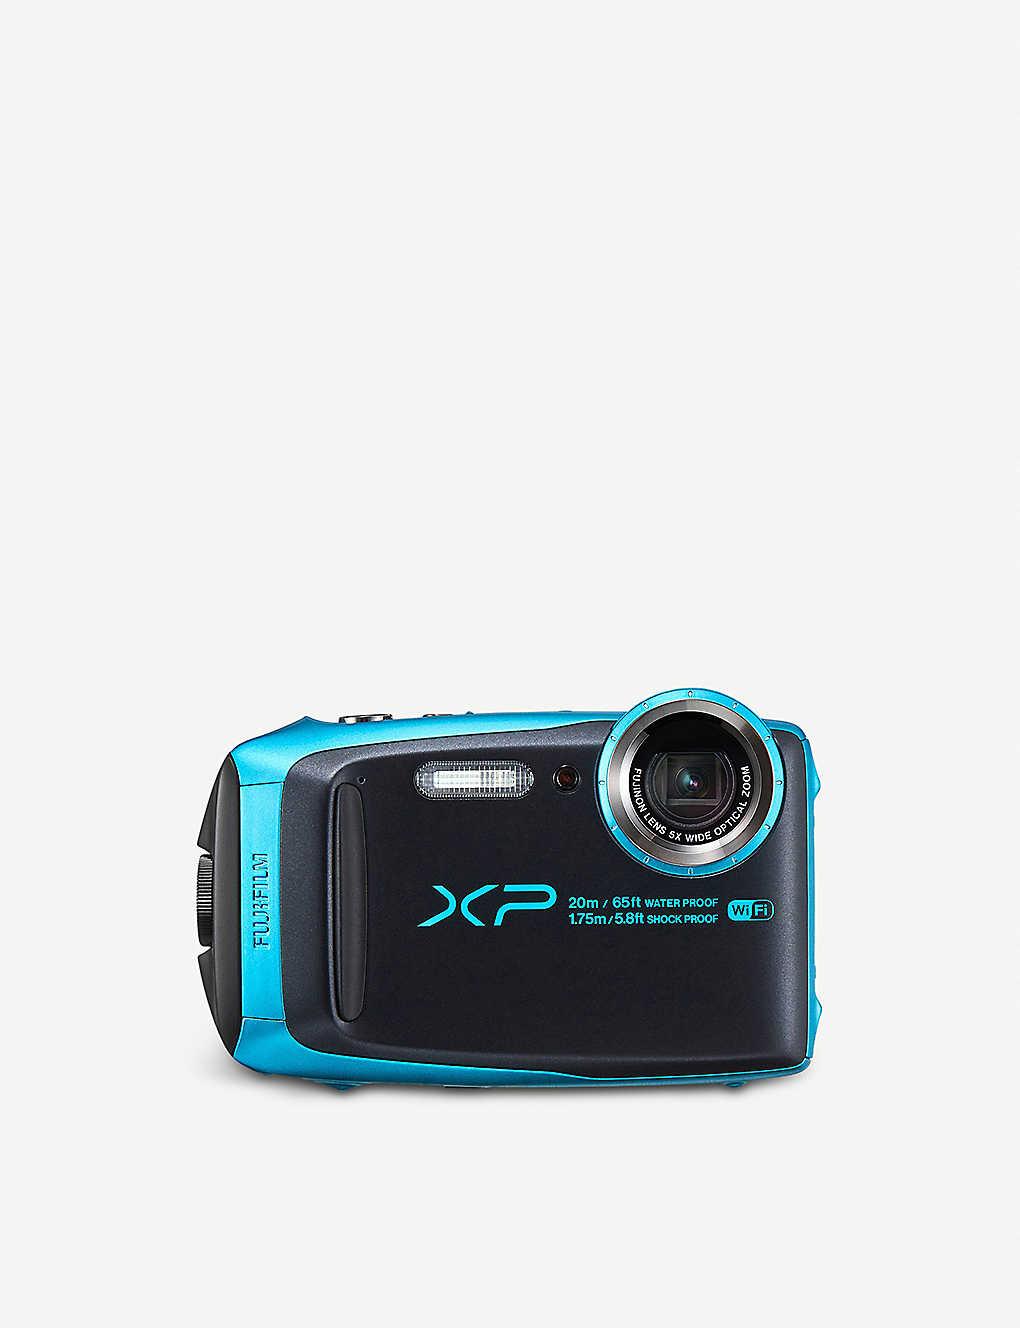 Fujifilm Finepix Xp120 Digital Camera Selfridges Com